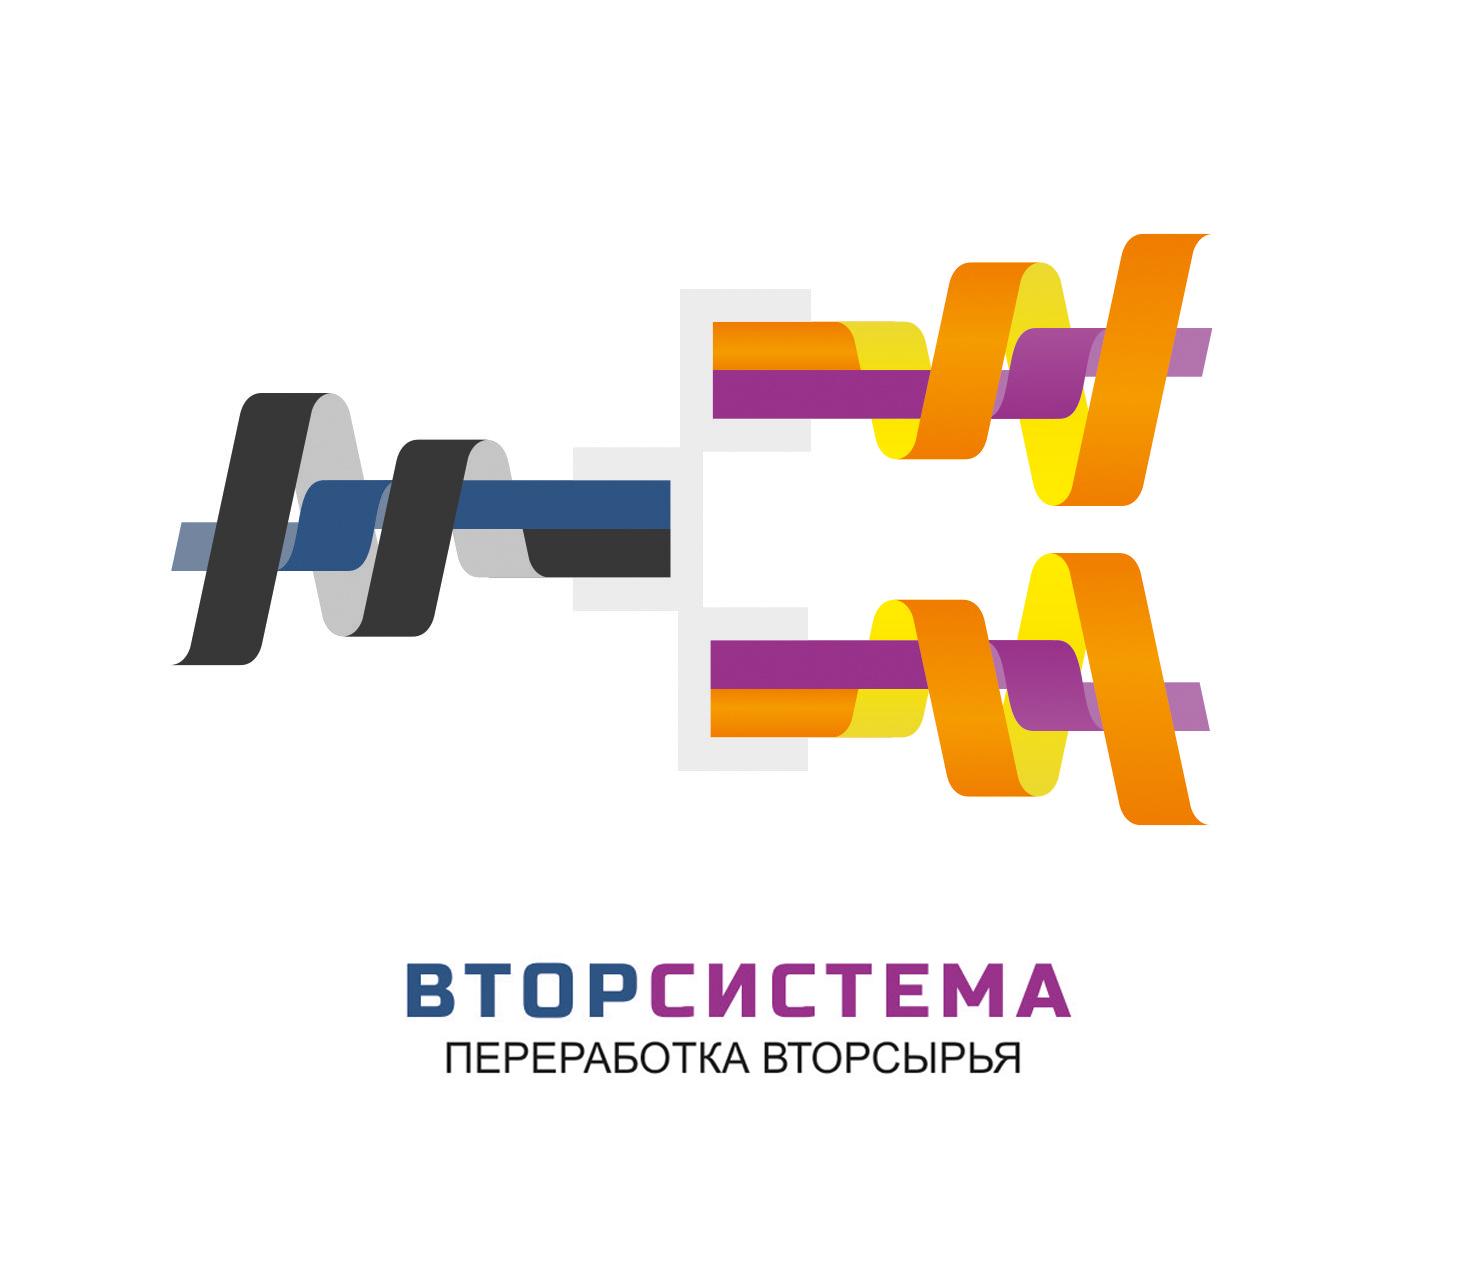 Нужно разработать логотип и дизайн визитки фото f_0305550afd644f72.jpg